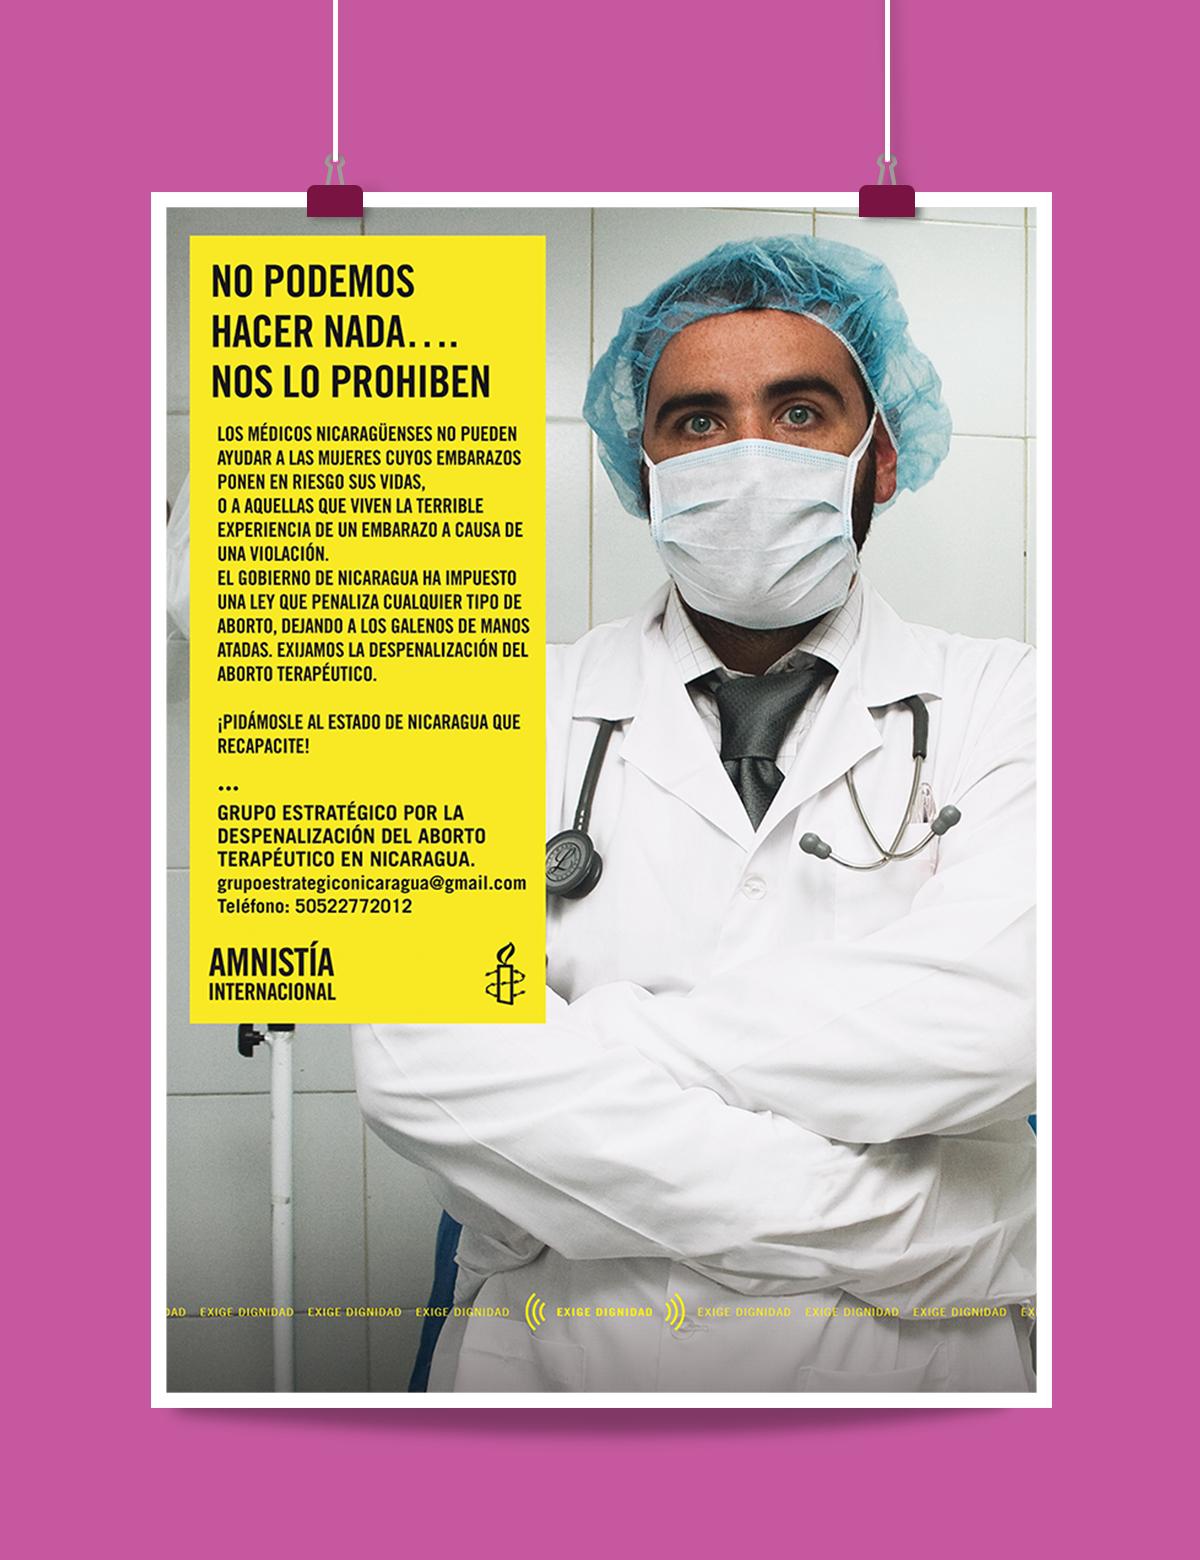 Anmistia Internacional